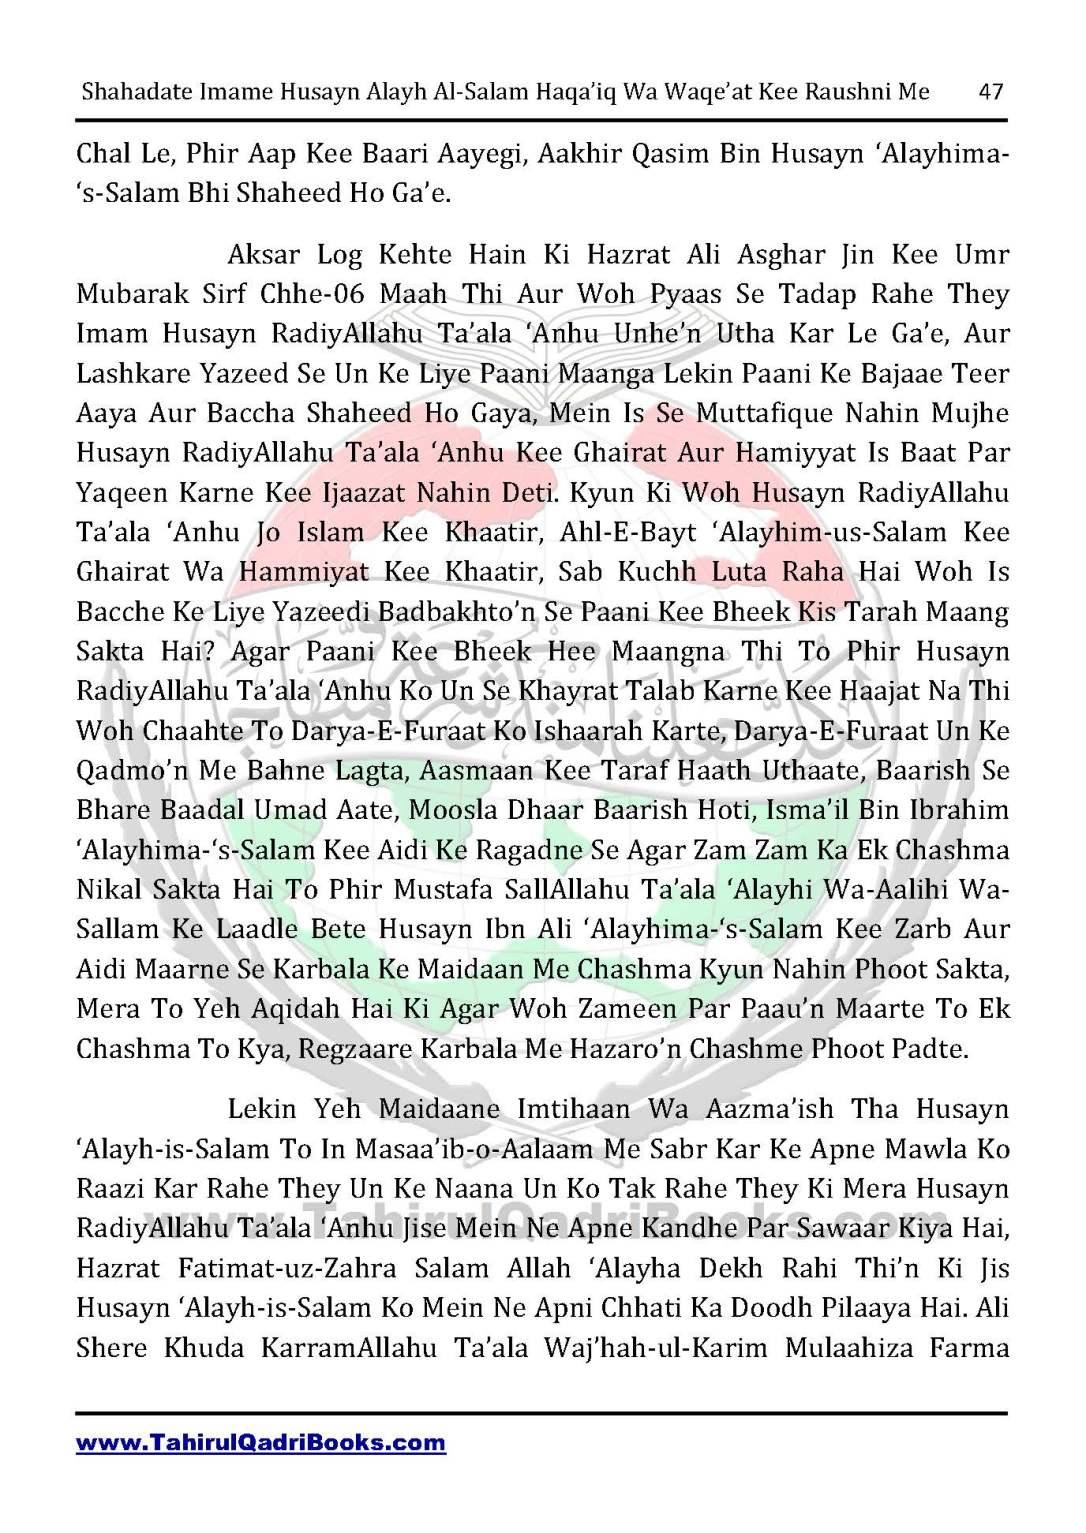 shahadate-imame-husayn-alayh-is-salam-haqaiq-wa-waqe_at-kee-raushni-me-in-roman-urdu-unlocked_Page_47